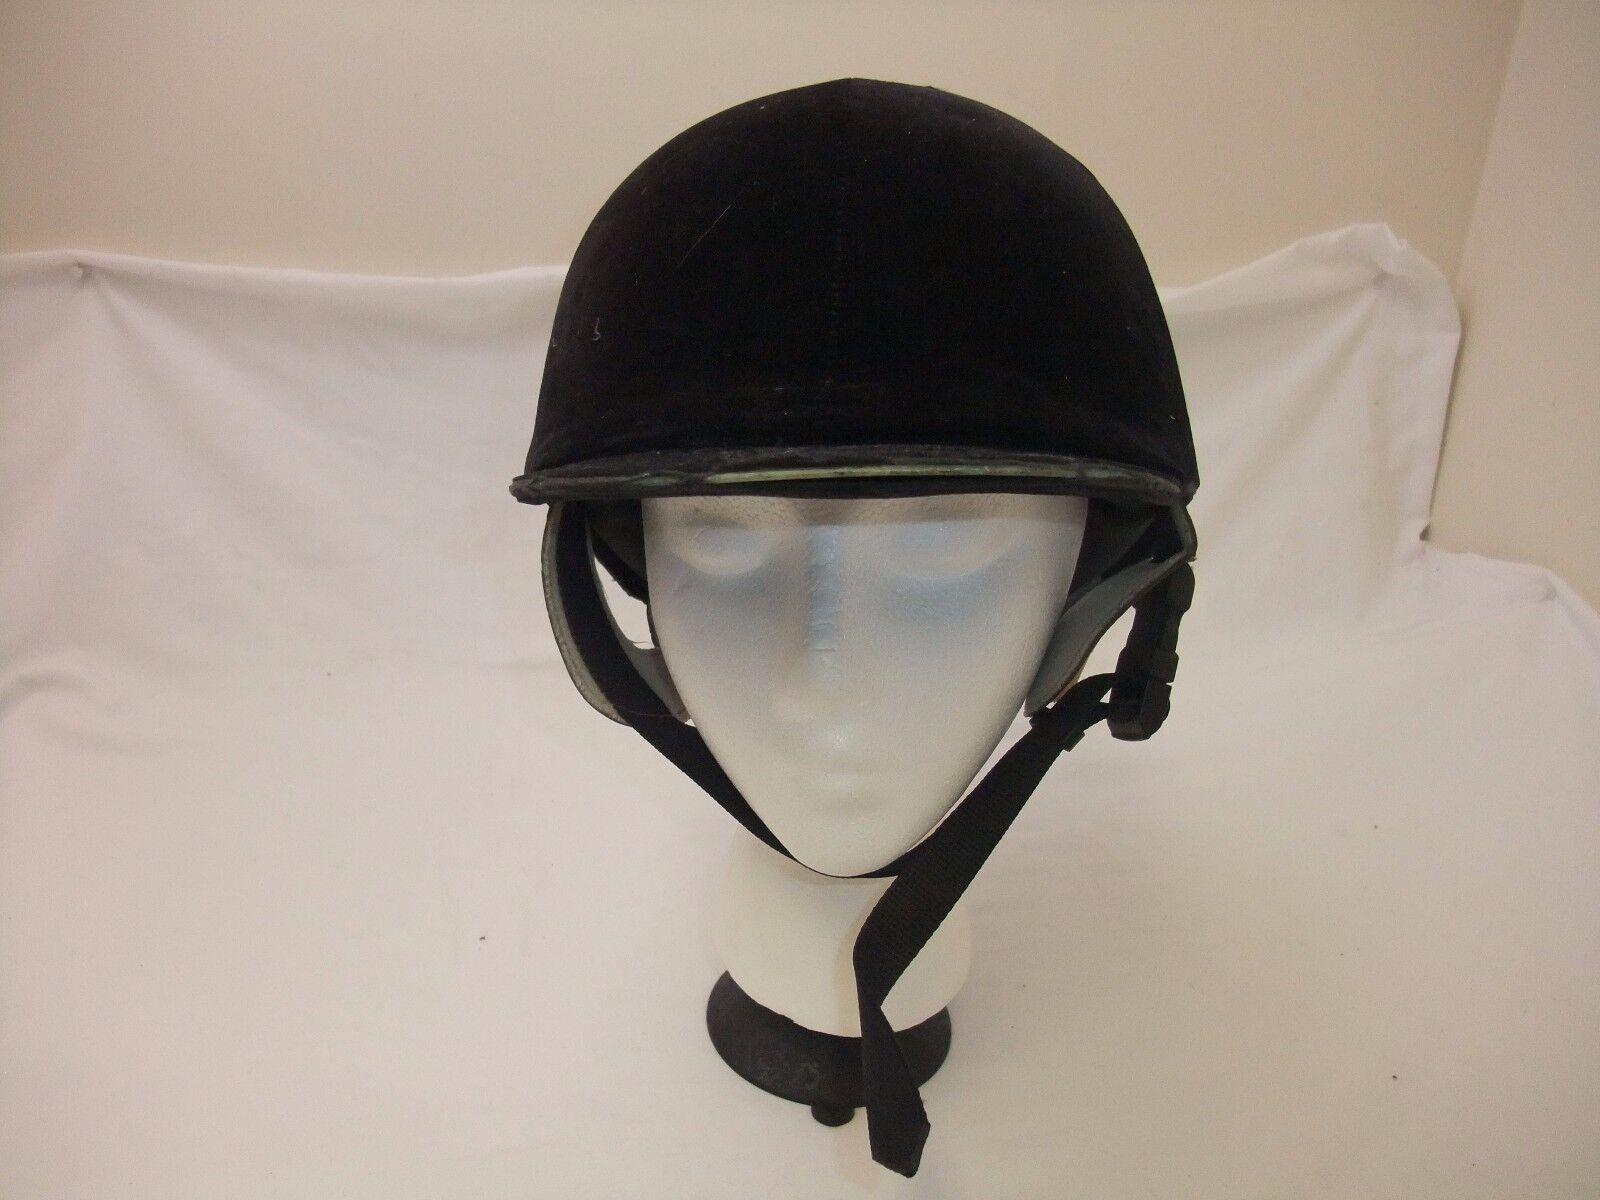 Vintage IRH Pro  Rider The Intelligent Riding Helmet Size Medium  free shipping on all orders